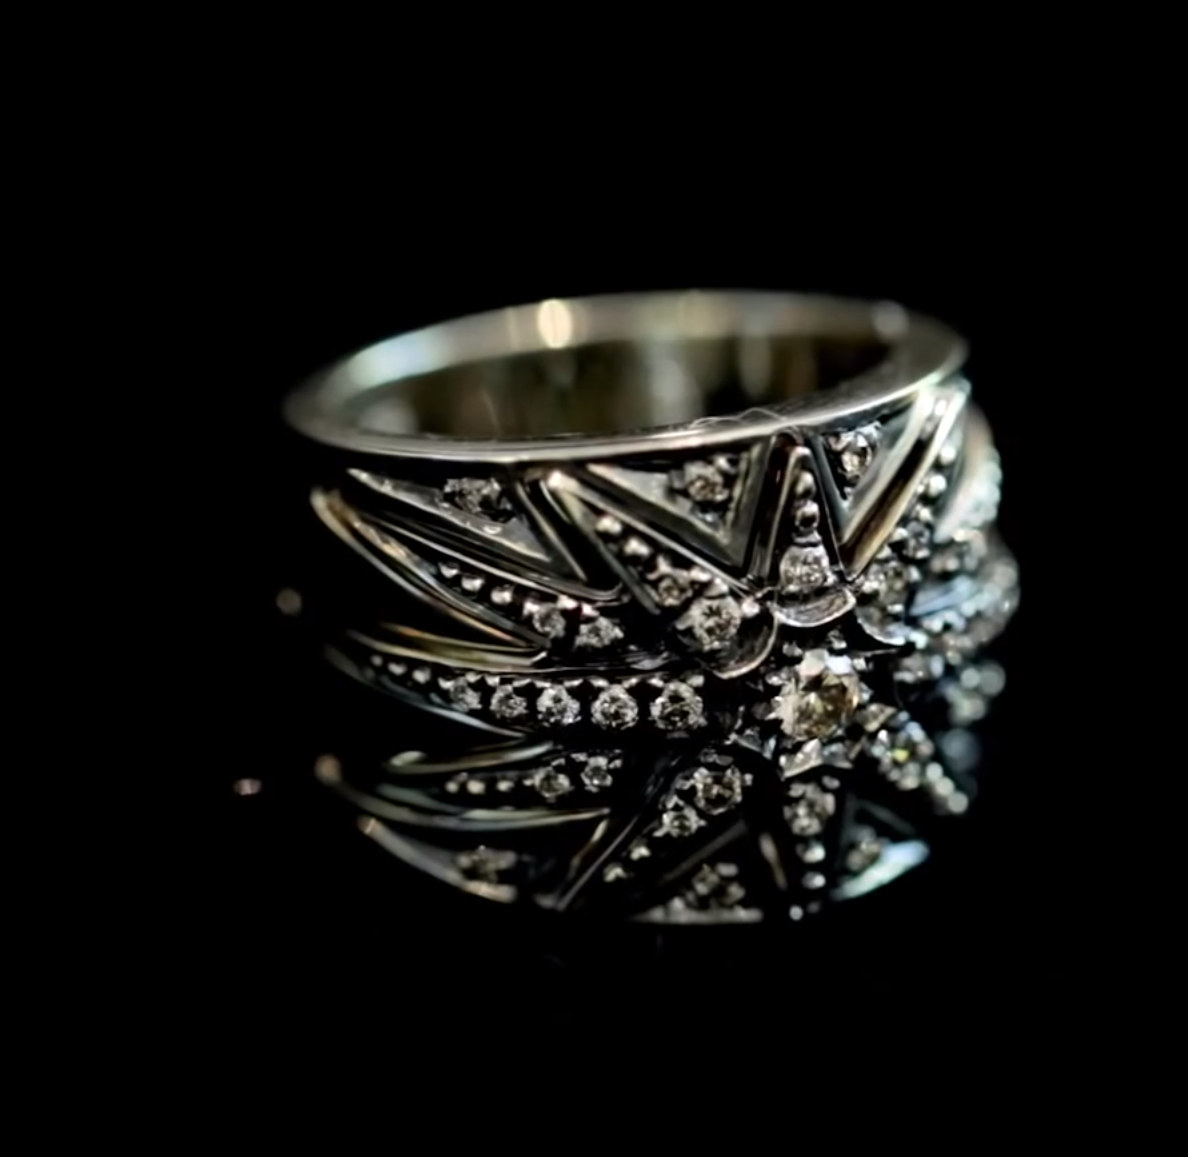 Tiffany Russian Wedding Ring 11 Cool H Stern diamond and